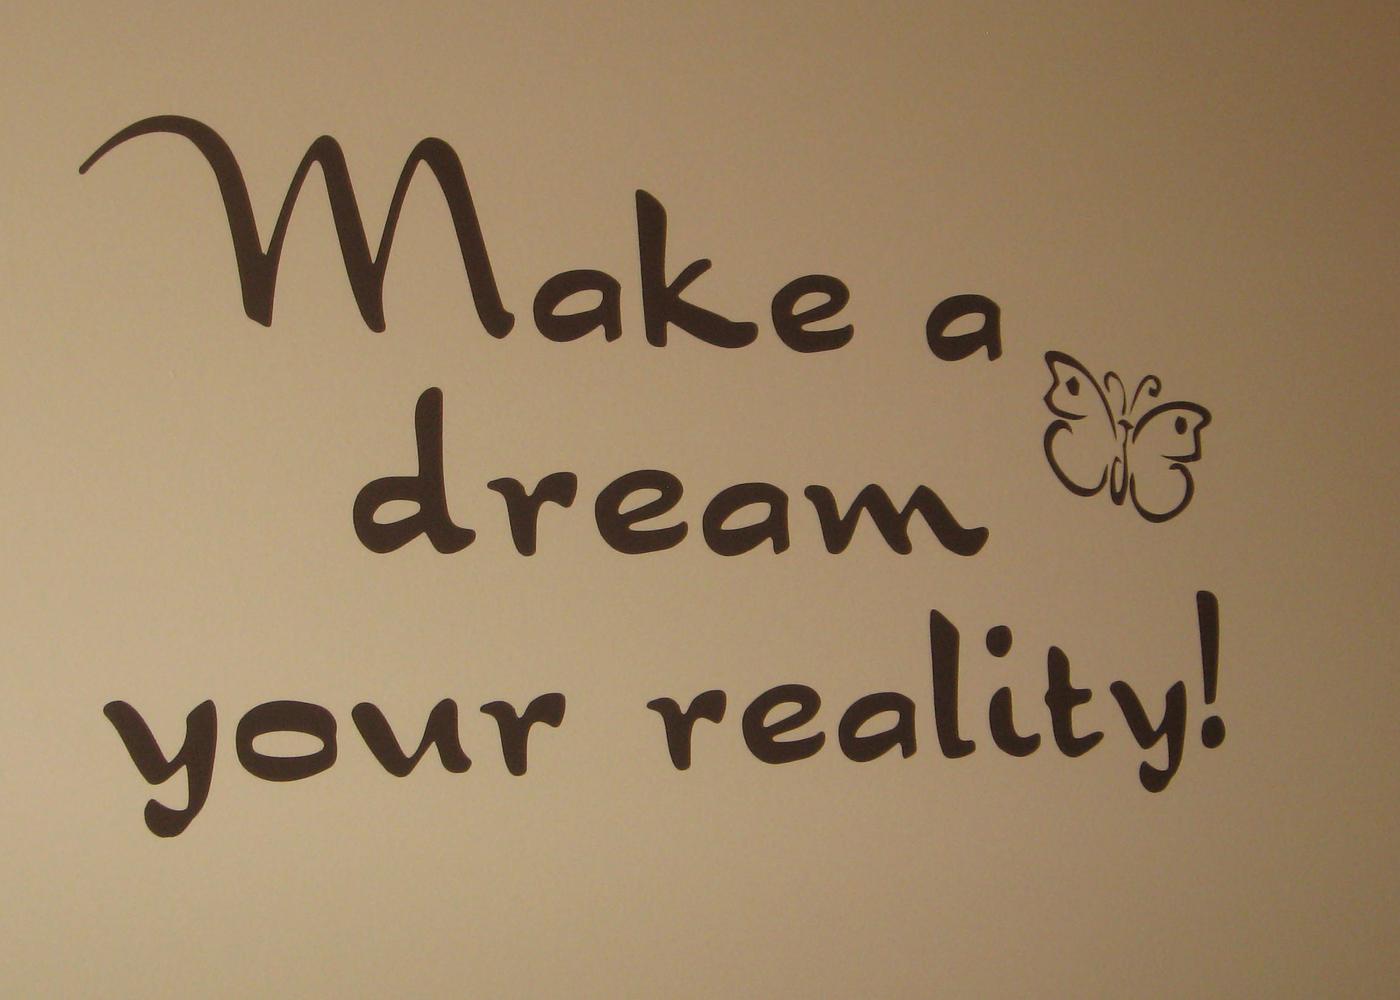 make-a-dream-wall-sticker-inspirational-quote.jpg